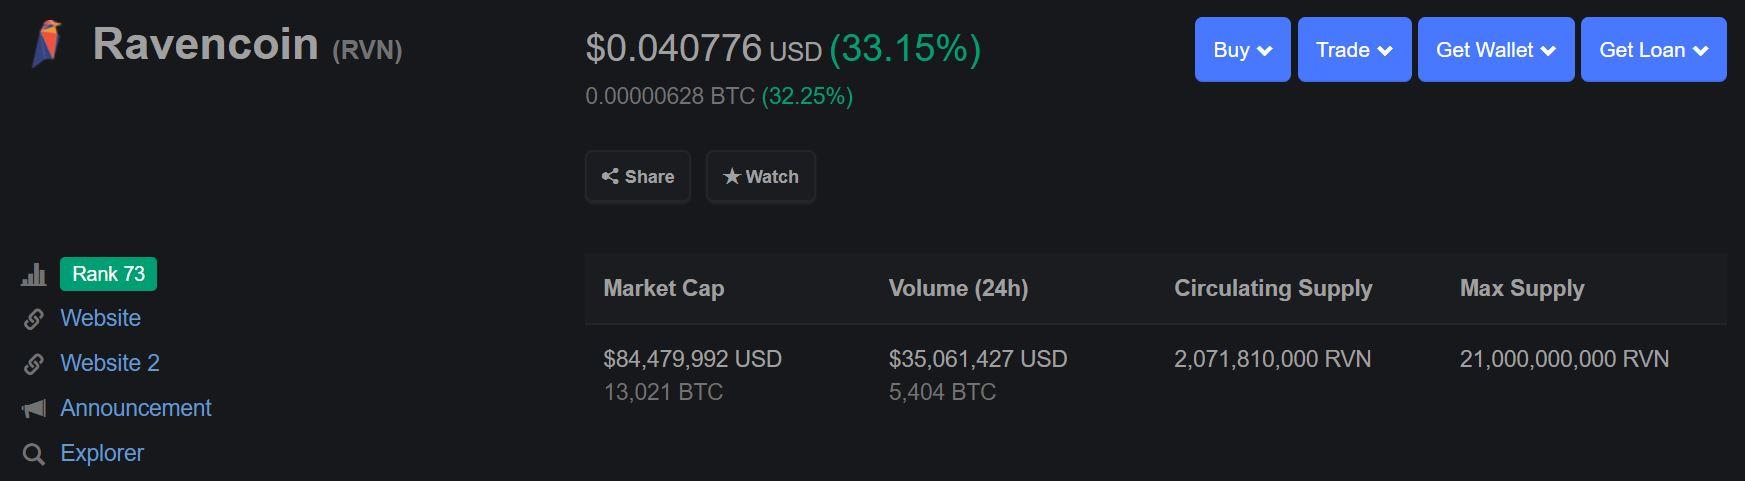 Ravencoin (RVN) Continues Surge, Up 200% Since Binance News 1